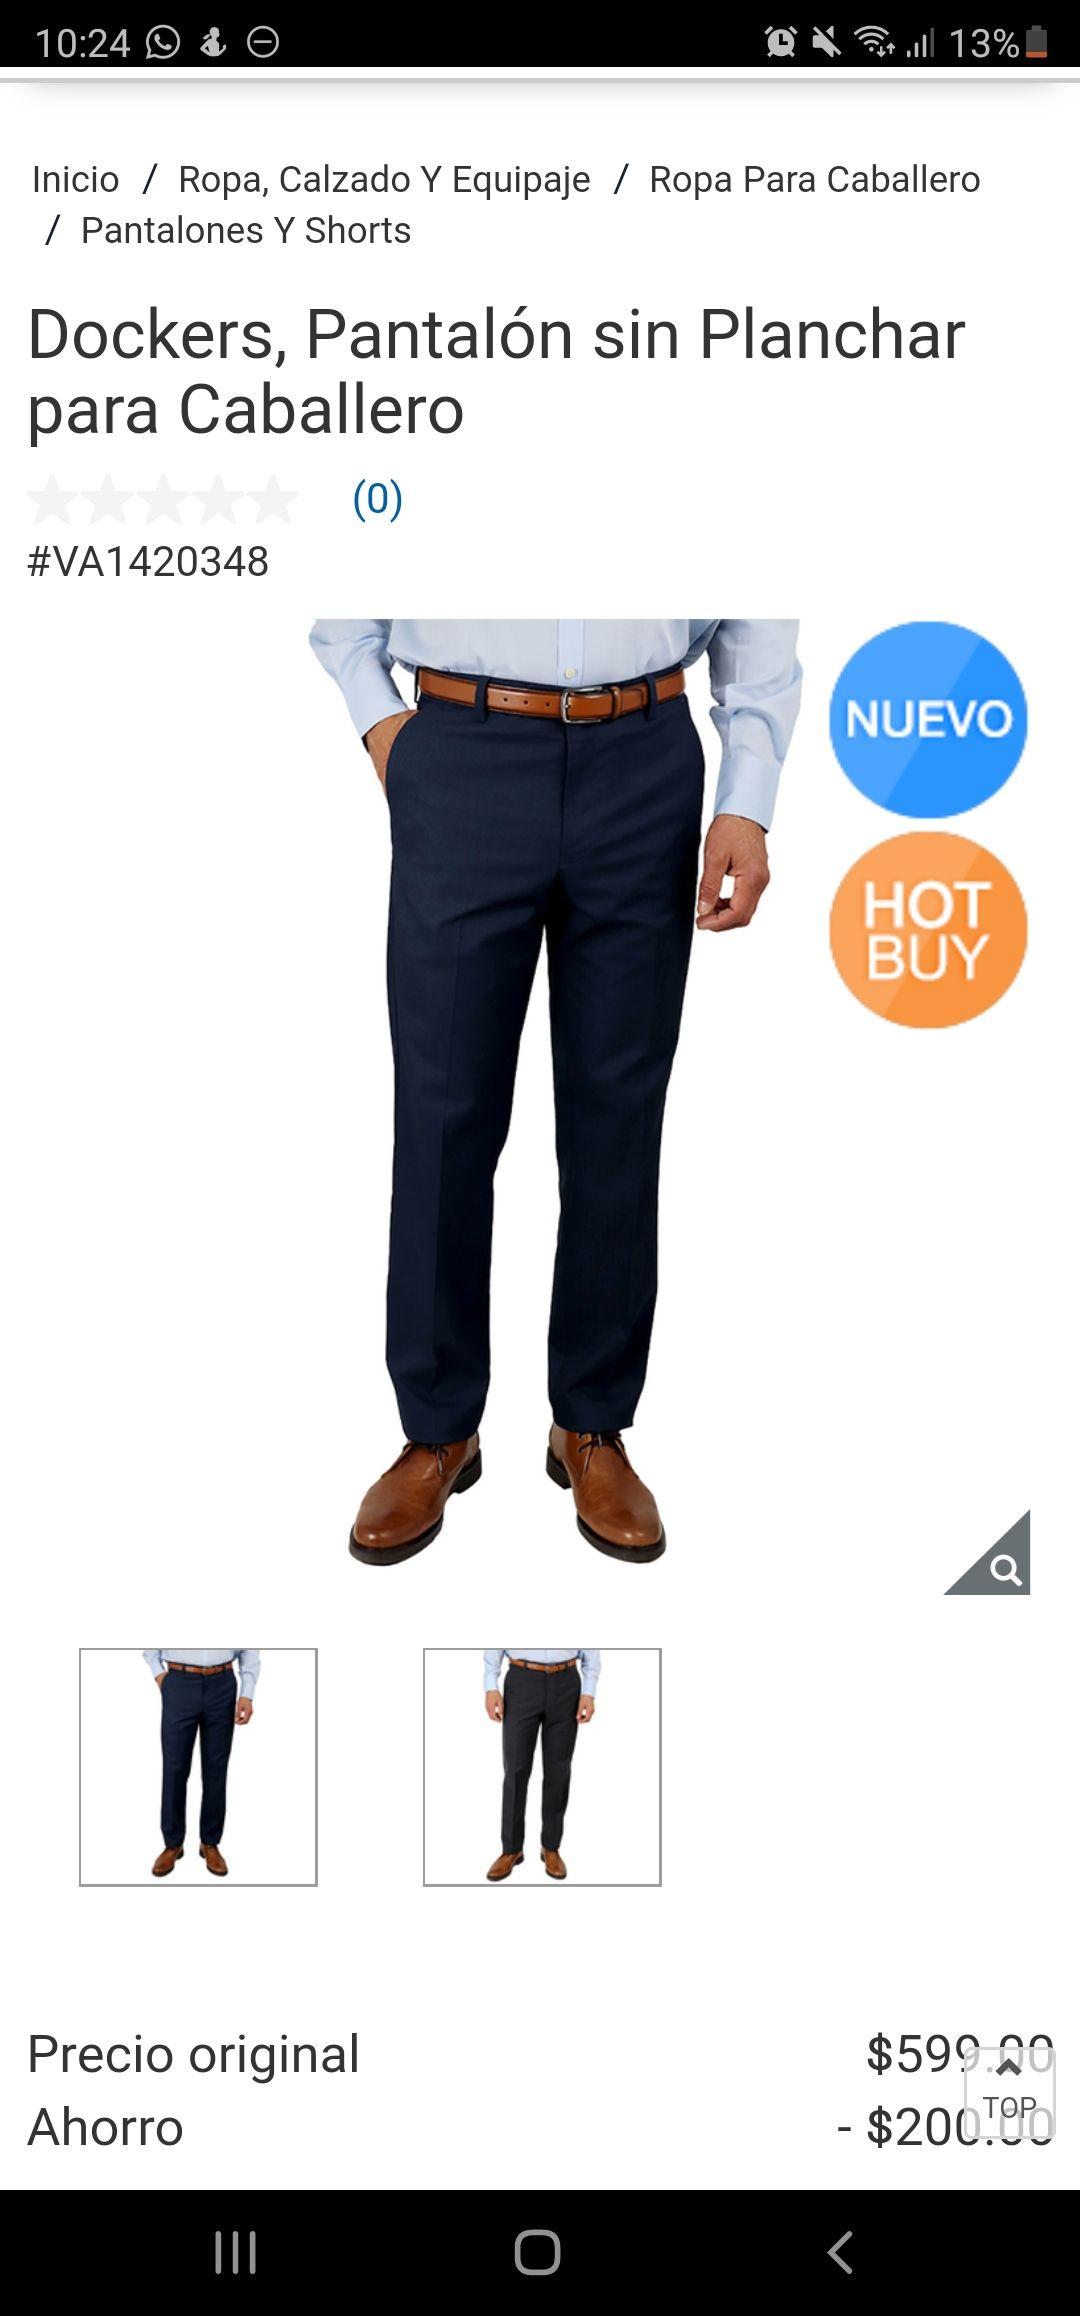 Costco: Dockers, Pantalón sin Planchar para Caballero  (0